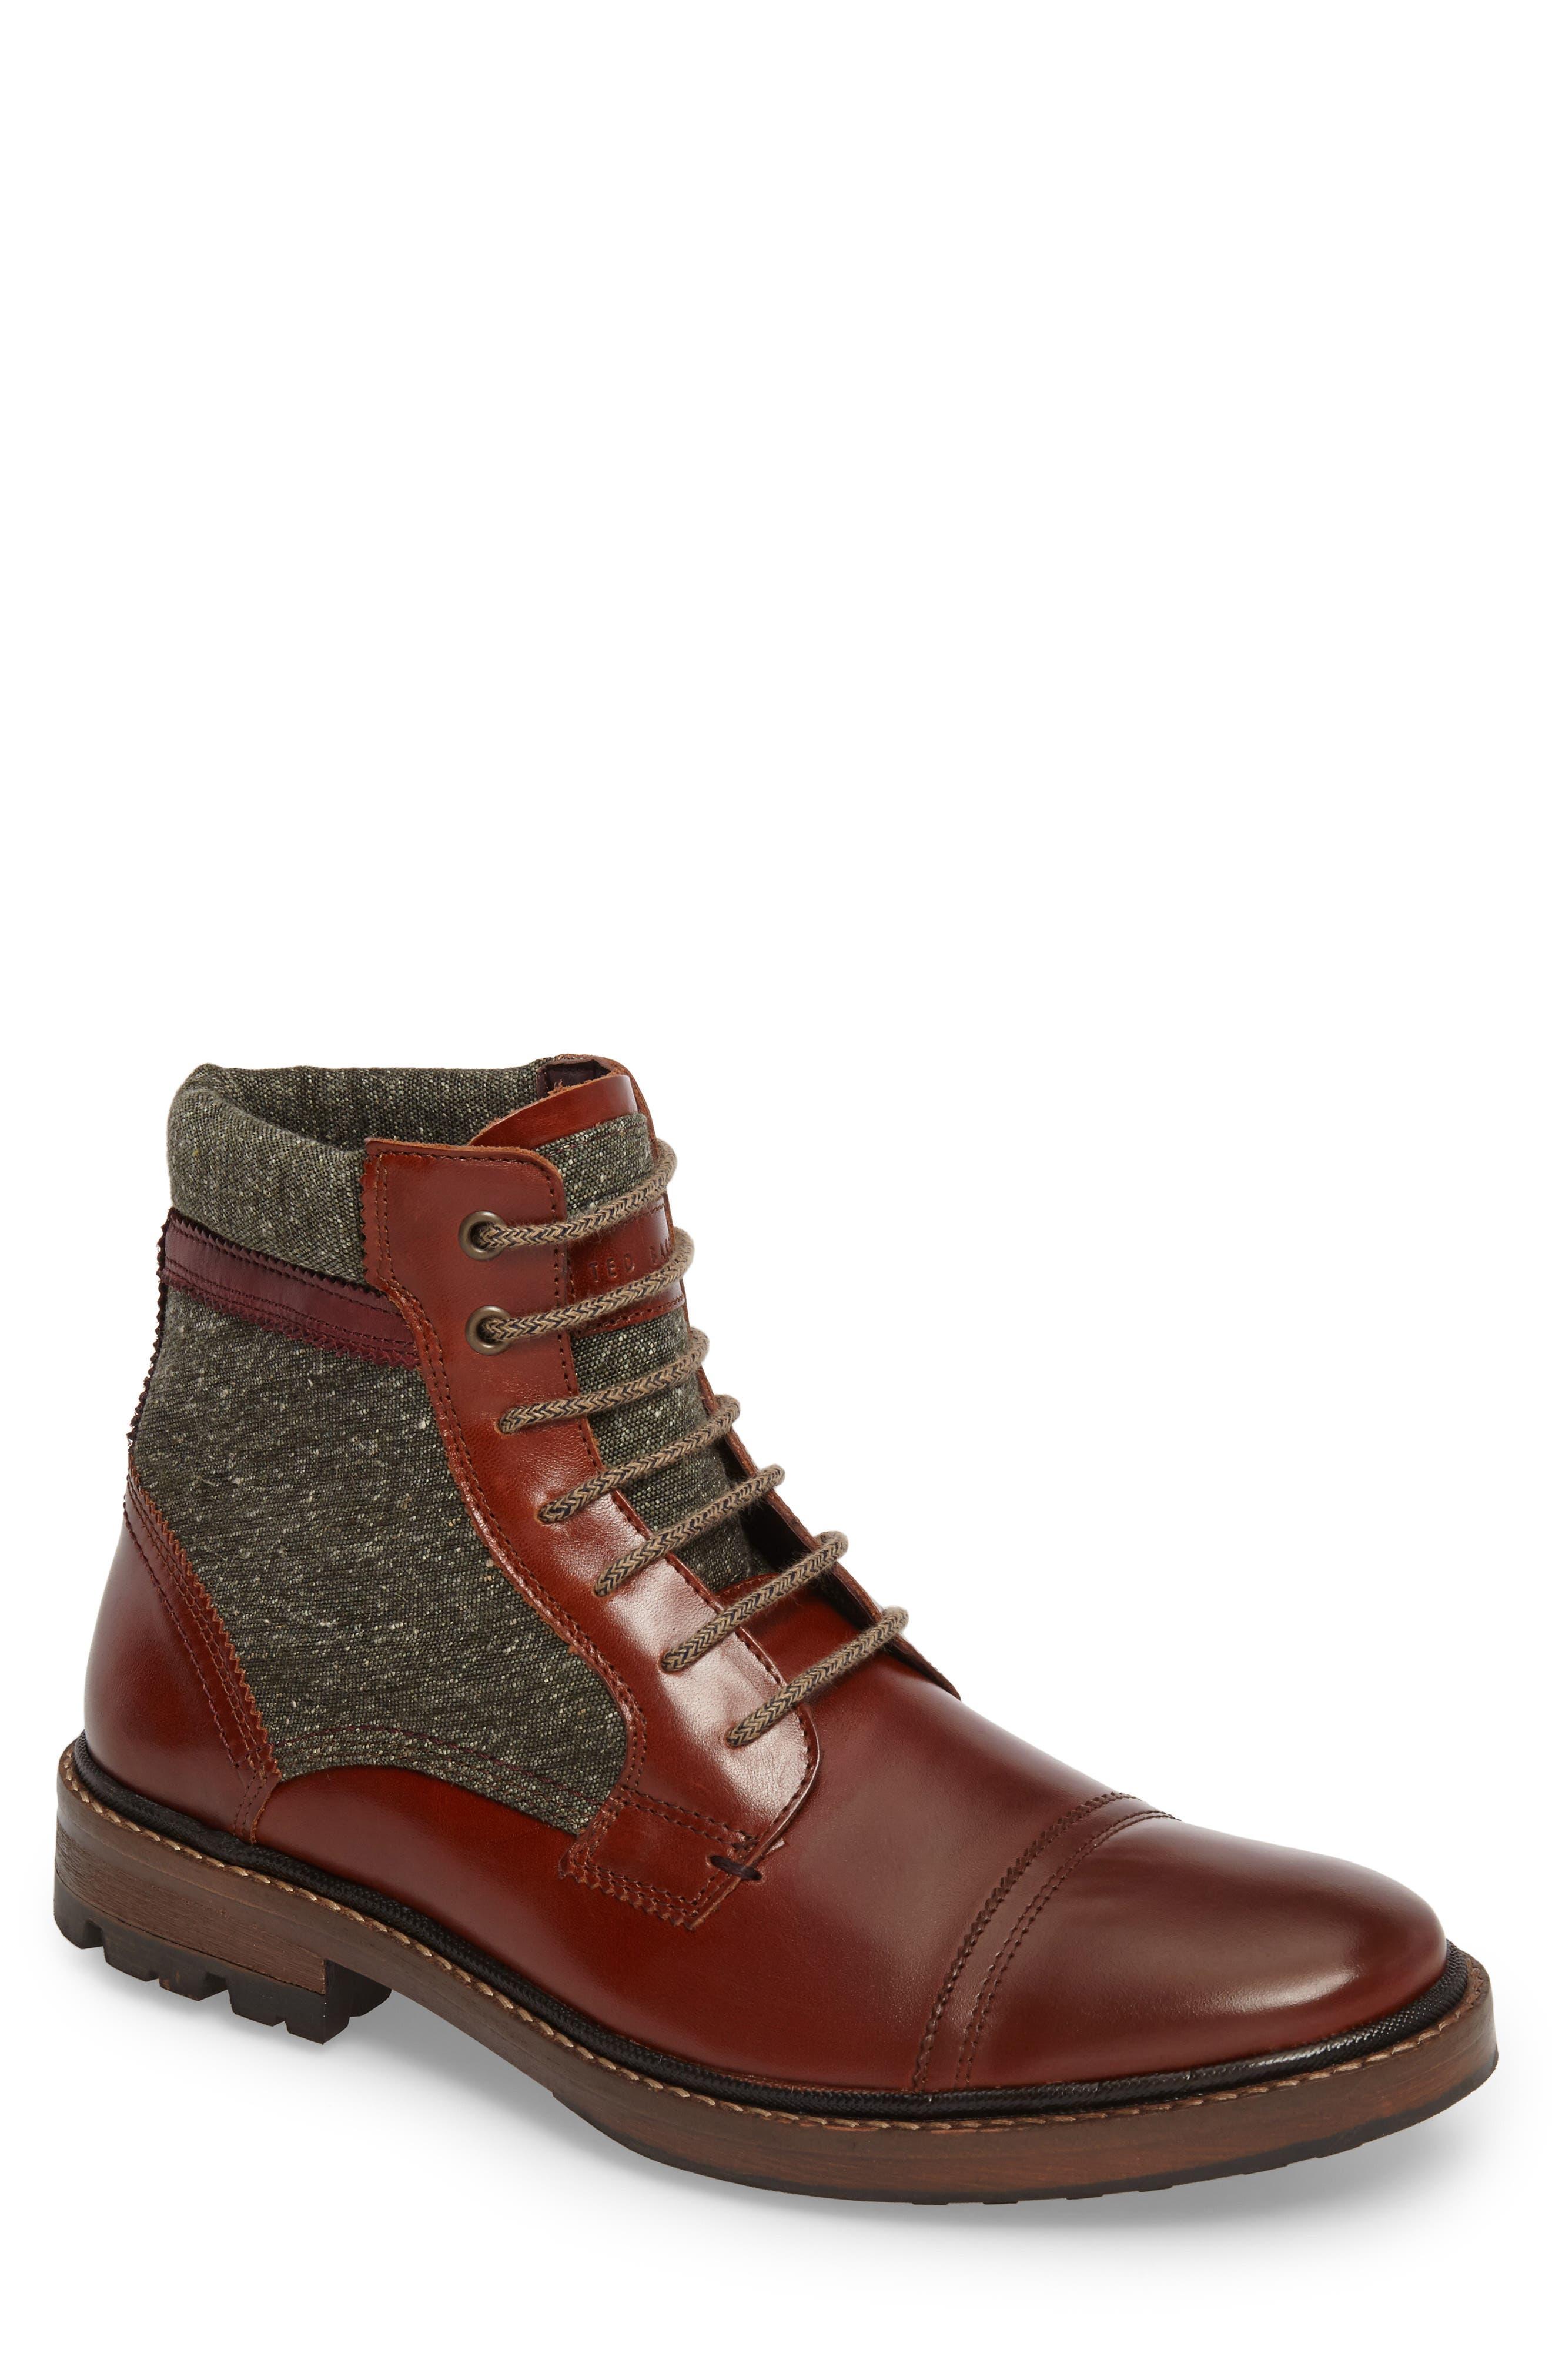 Ruulen Cap Toe Boot,                         Main,                         color, 203